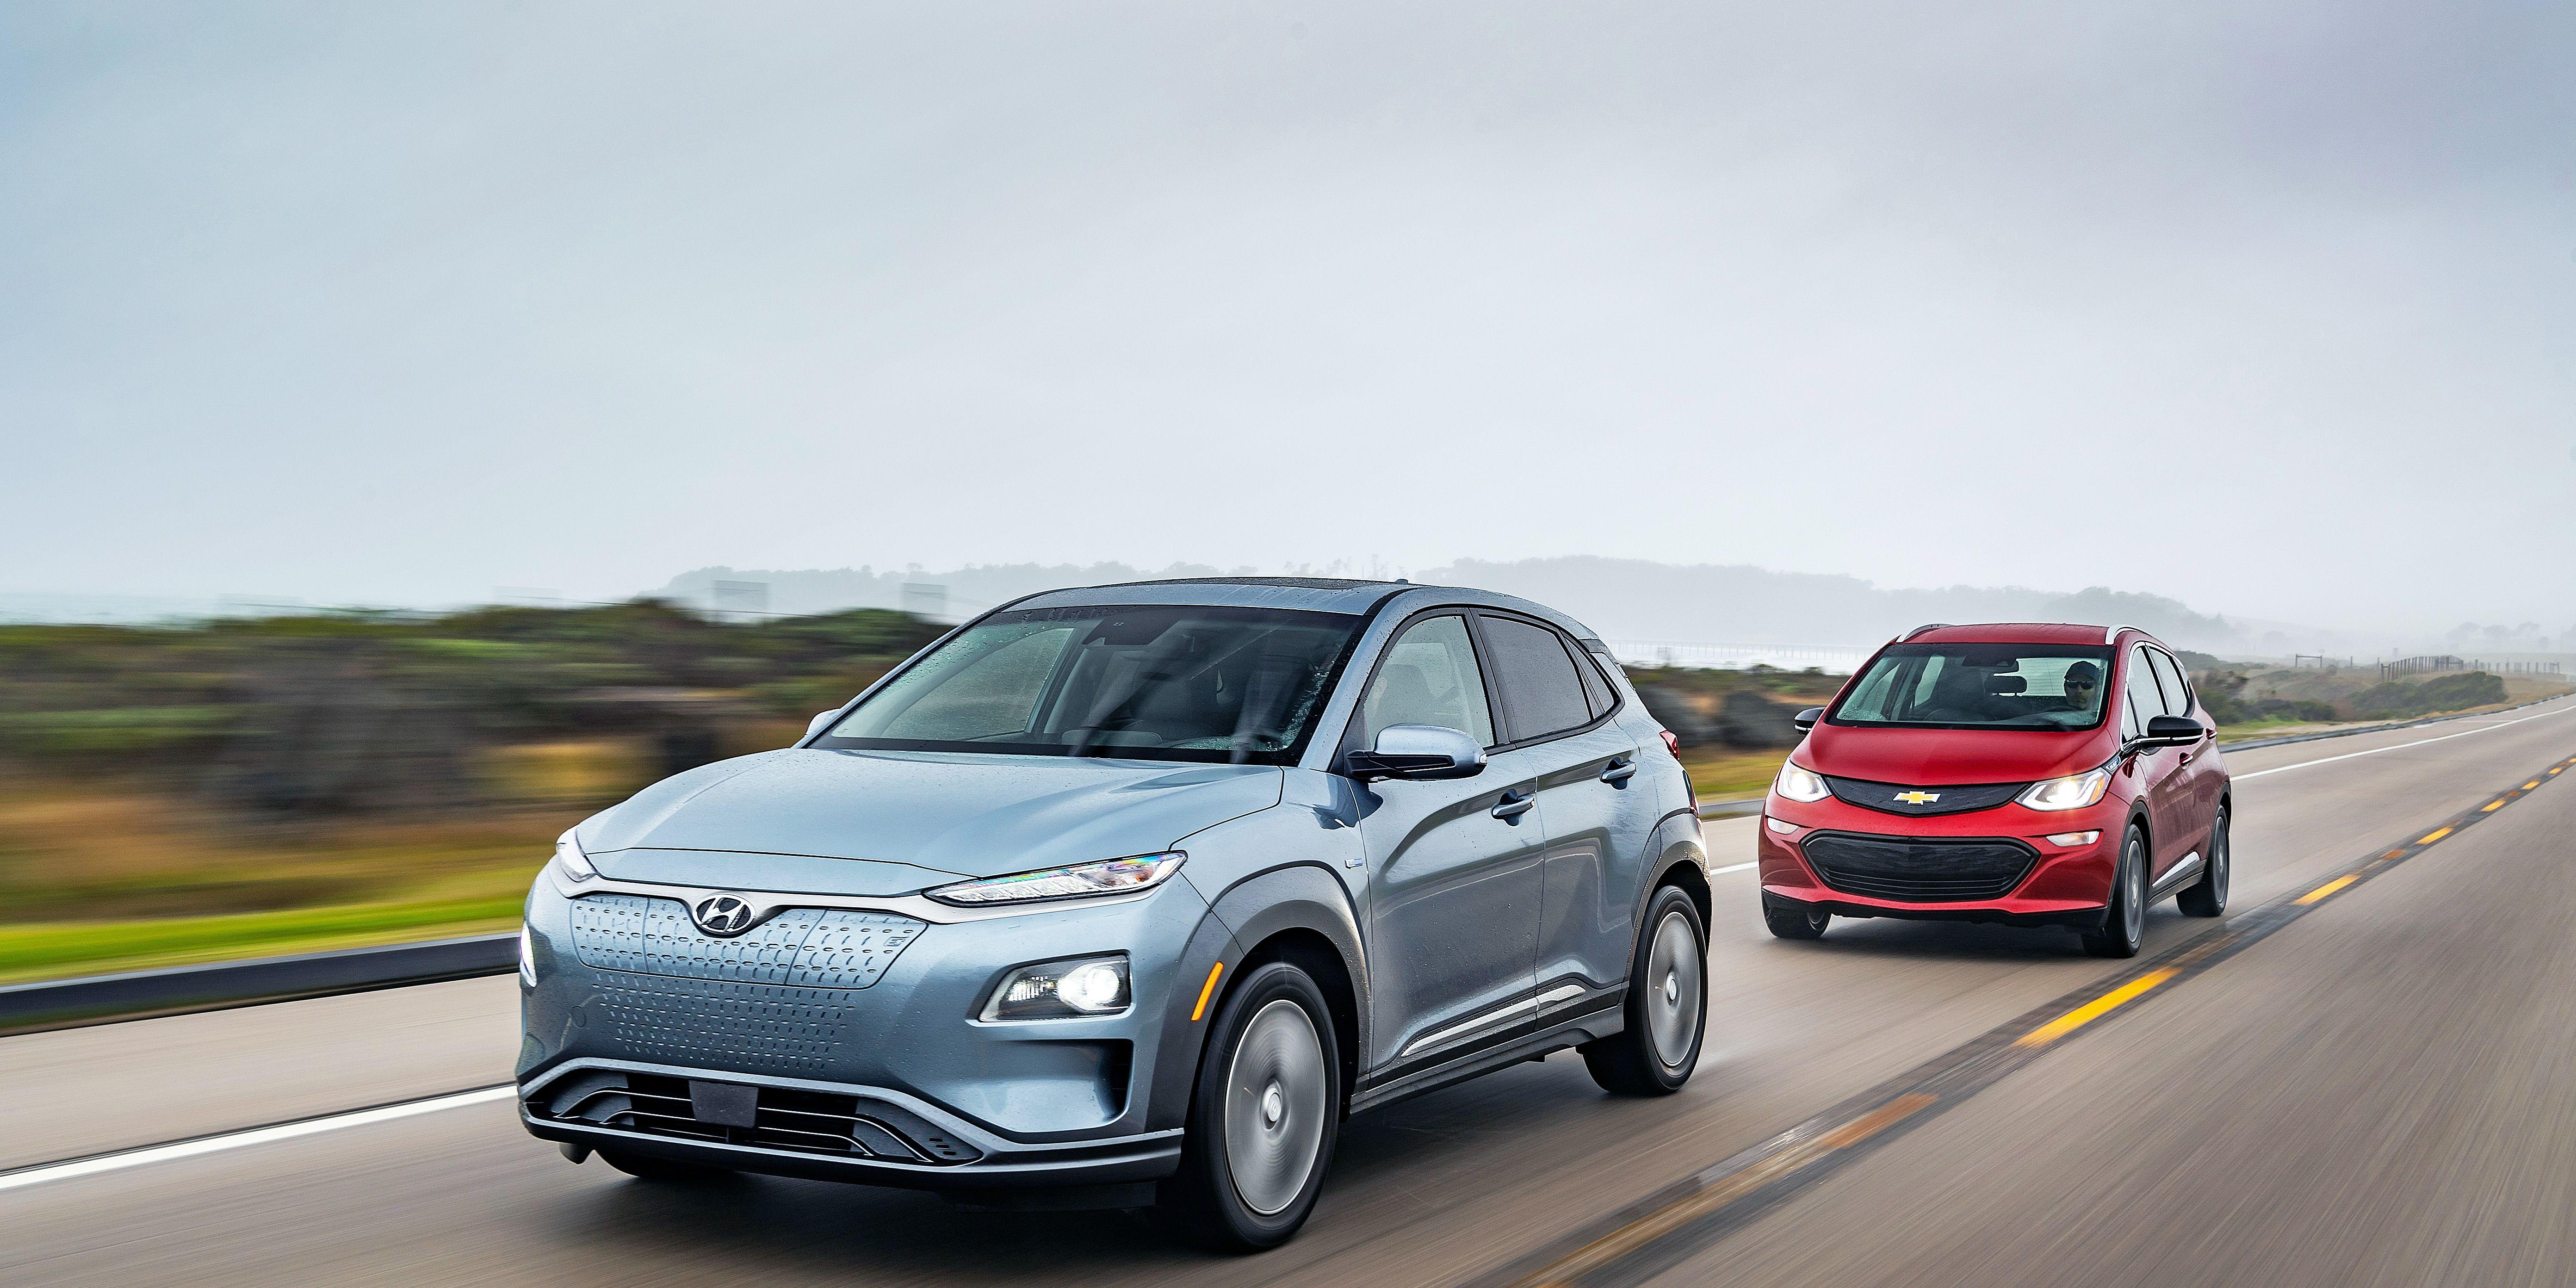 2019 Chevrolet Bolt EV and 2019 Hyundai Kona Electric Battle To Find the Best Alternative to the Tesla Model 3